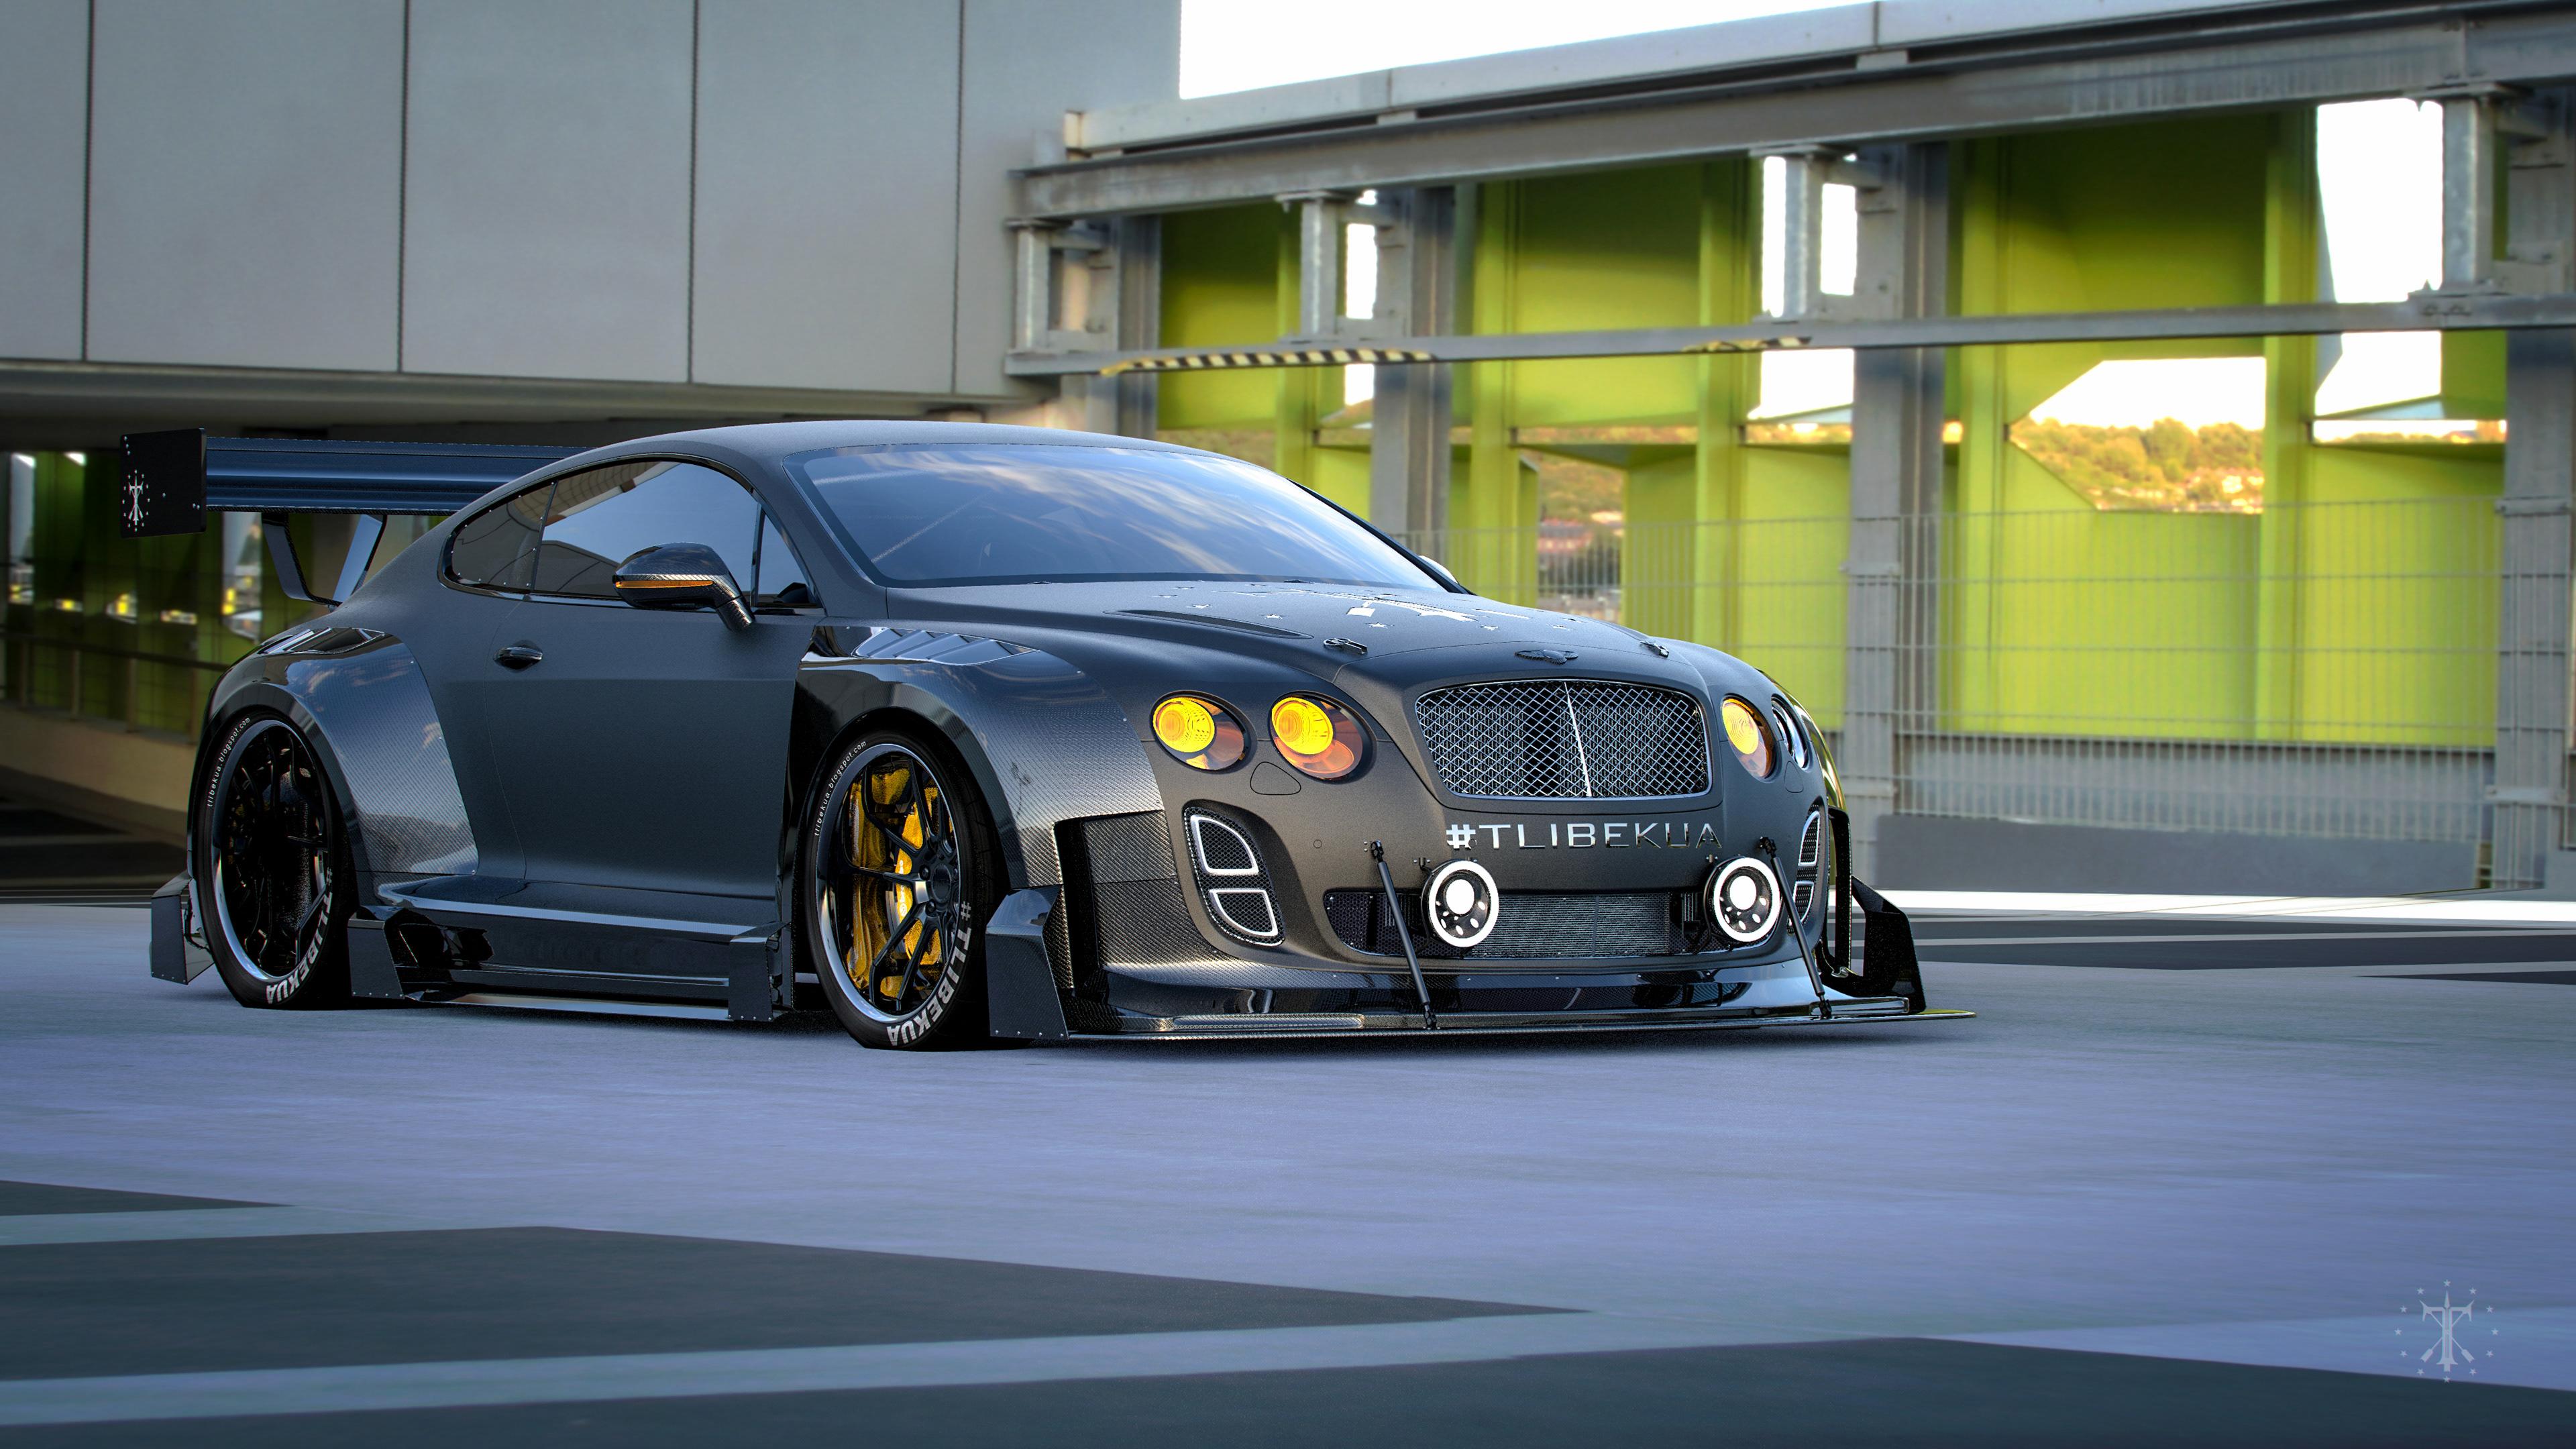 Kasim Tlibekov Tlibekua Bentley Continental Race kit